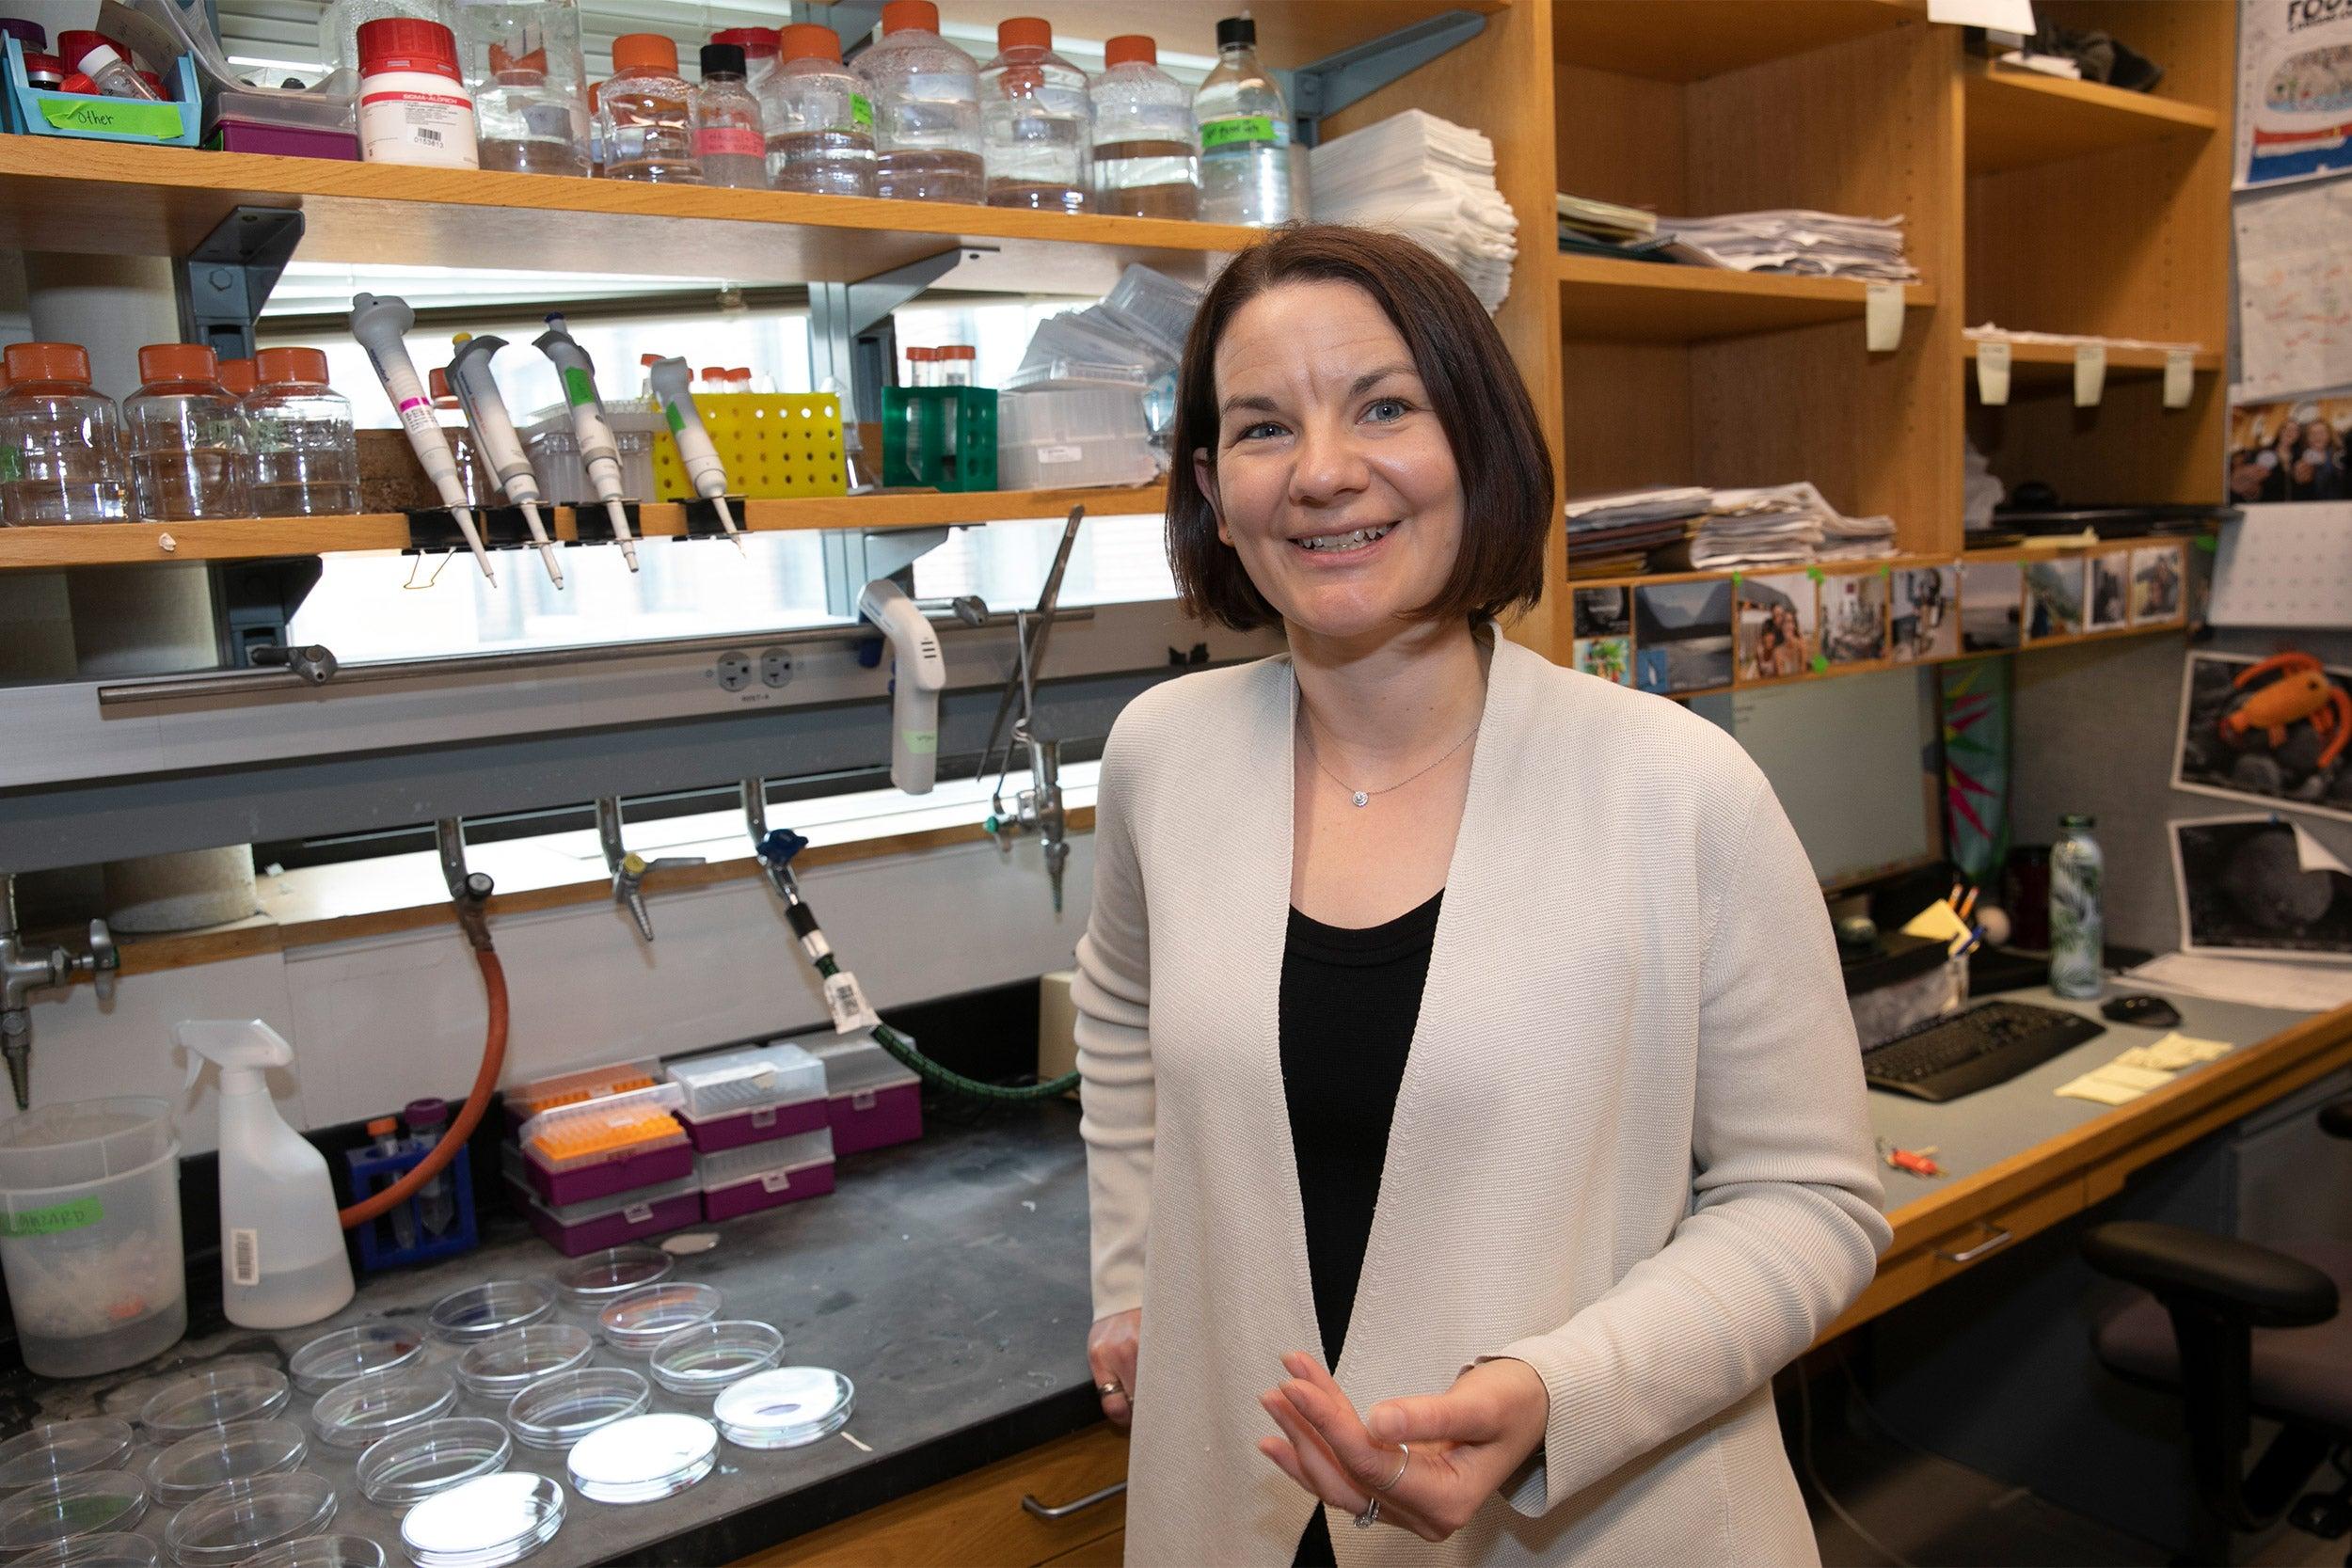 Microbe hunter Emily Balskus wins Blavatnik Award